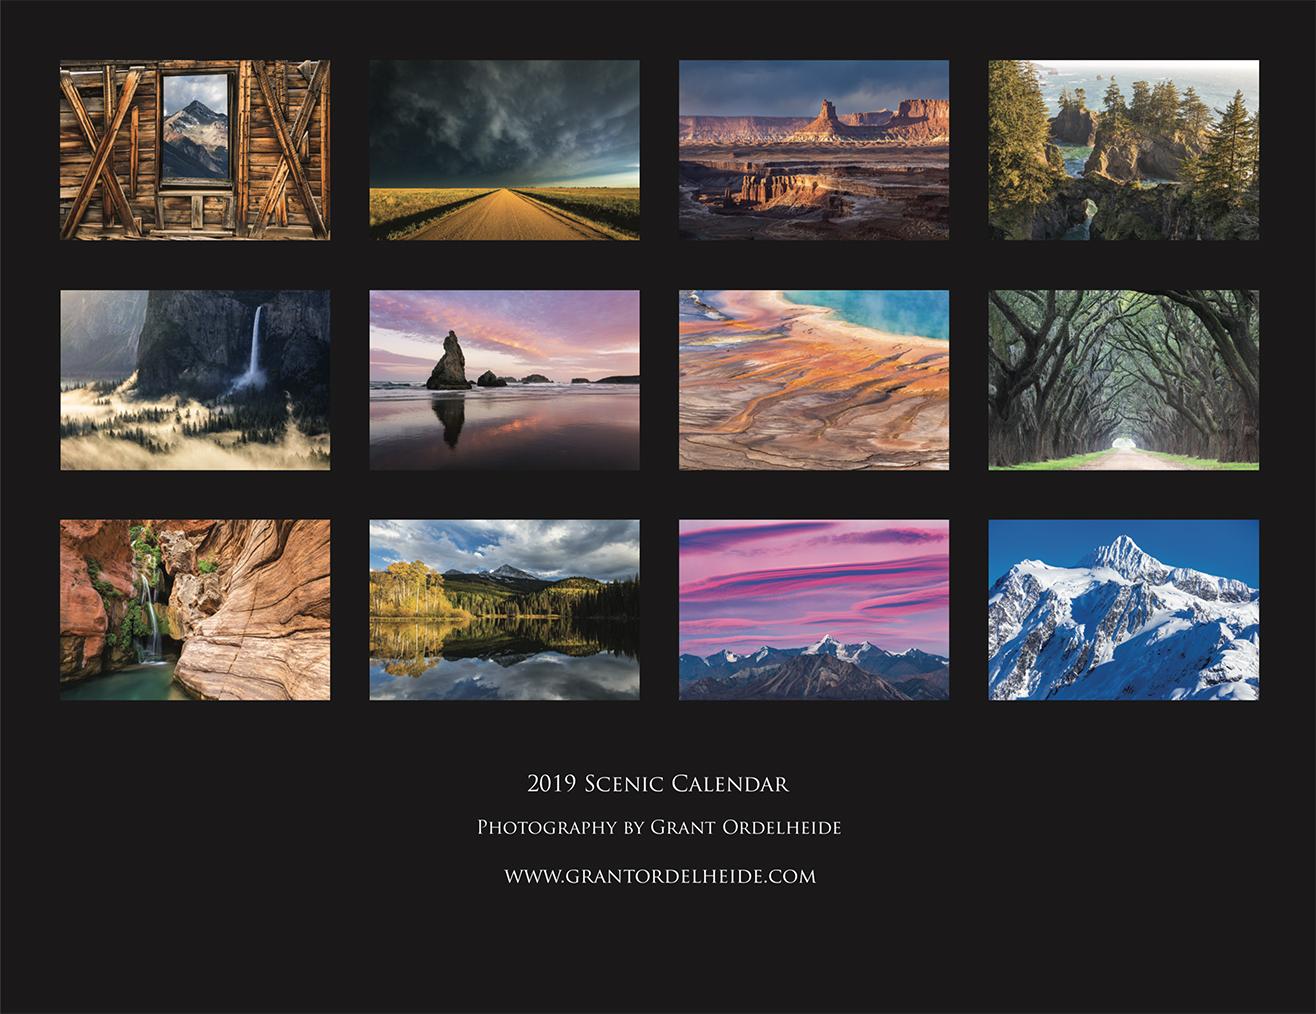 2019, scenic, calendar, photo